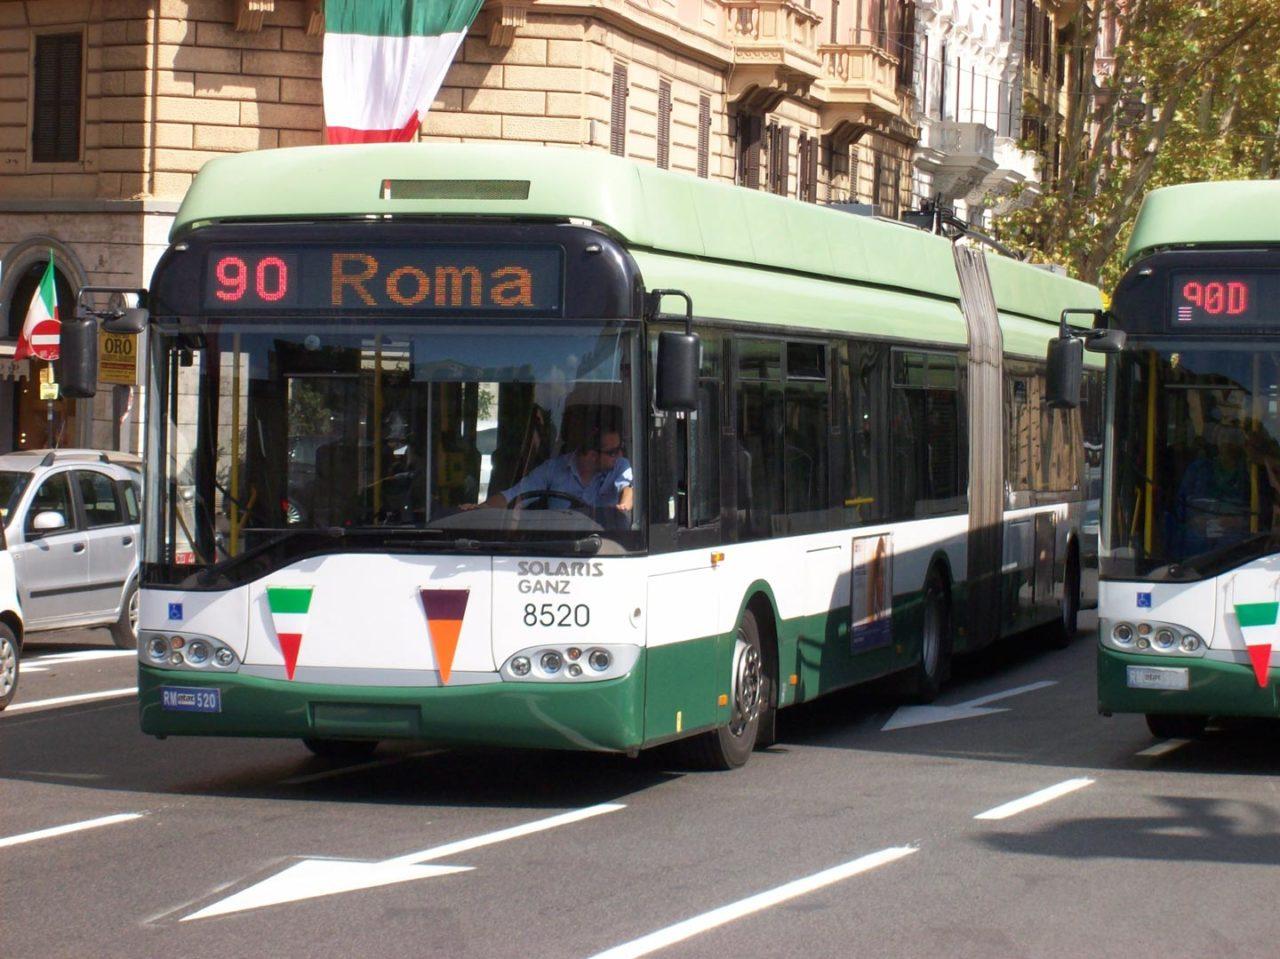 https://thesubmarine.it/wp-content/uploads/2017/07/2010-09-19_Solaris_Ganz_Trollino_ATAC_8520_Linea_90_Roma-1280x959.jpg